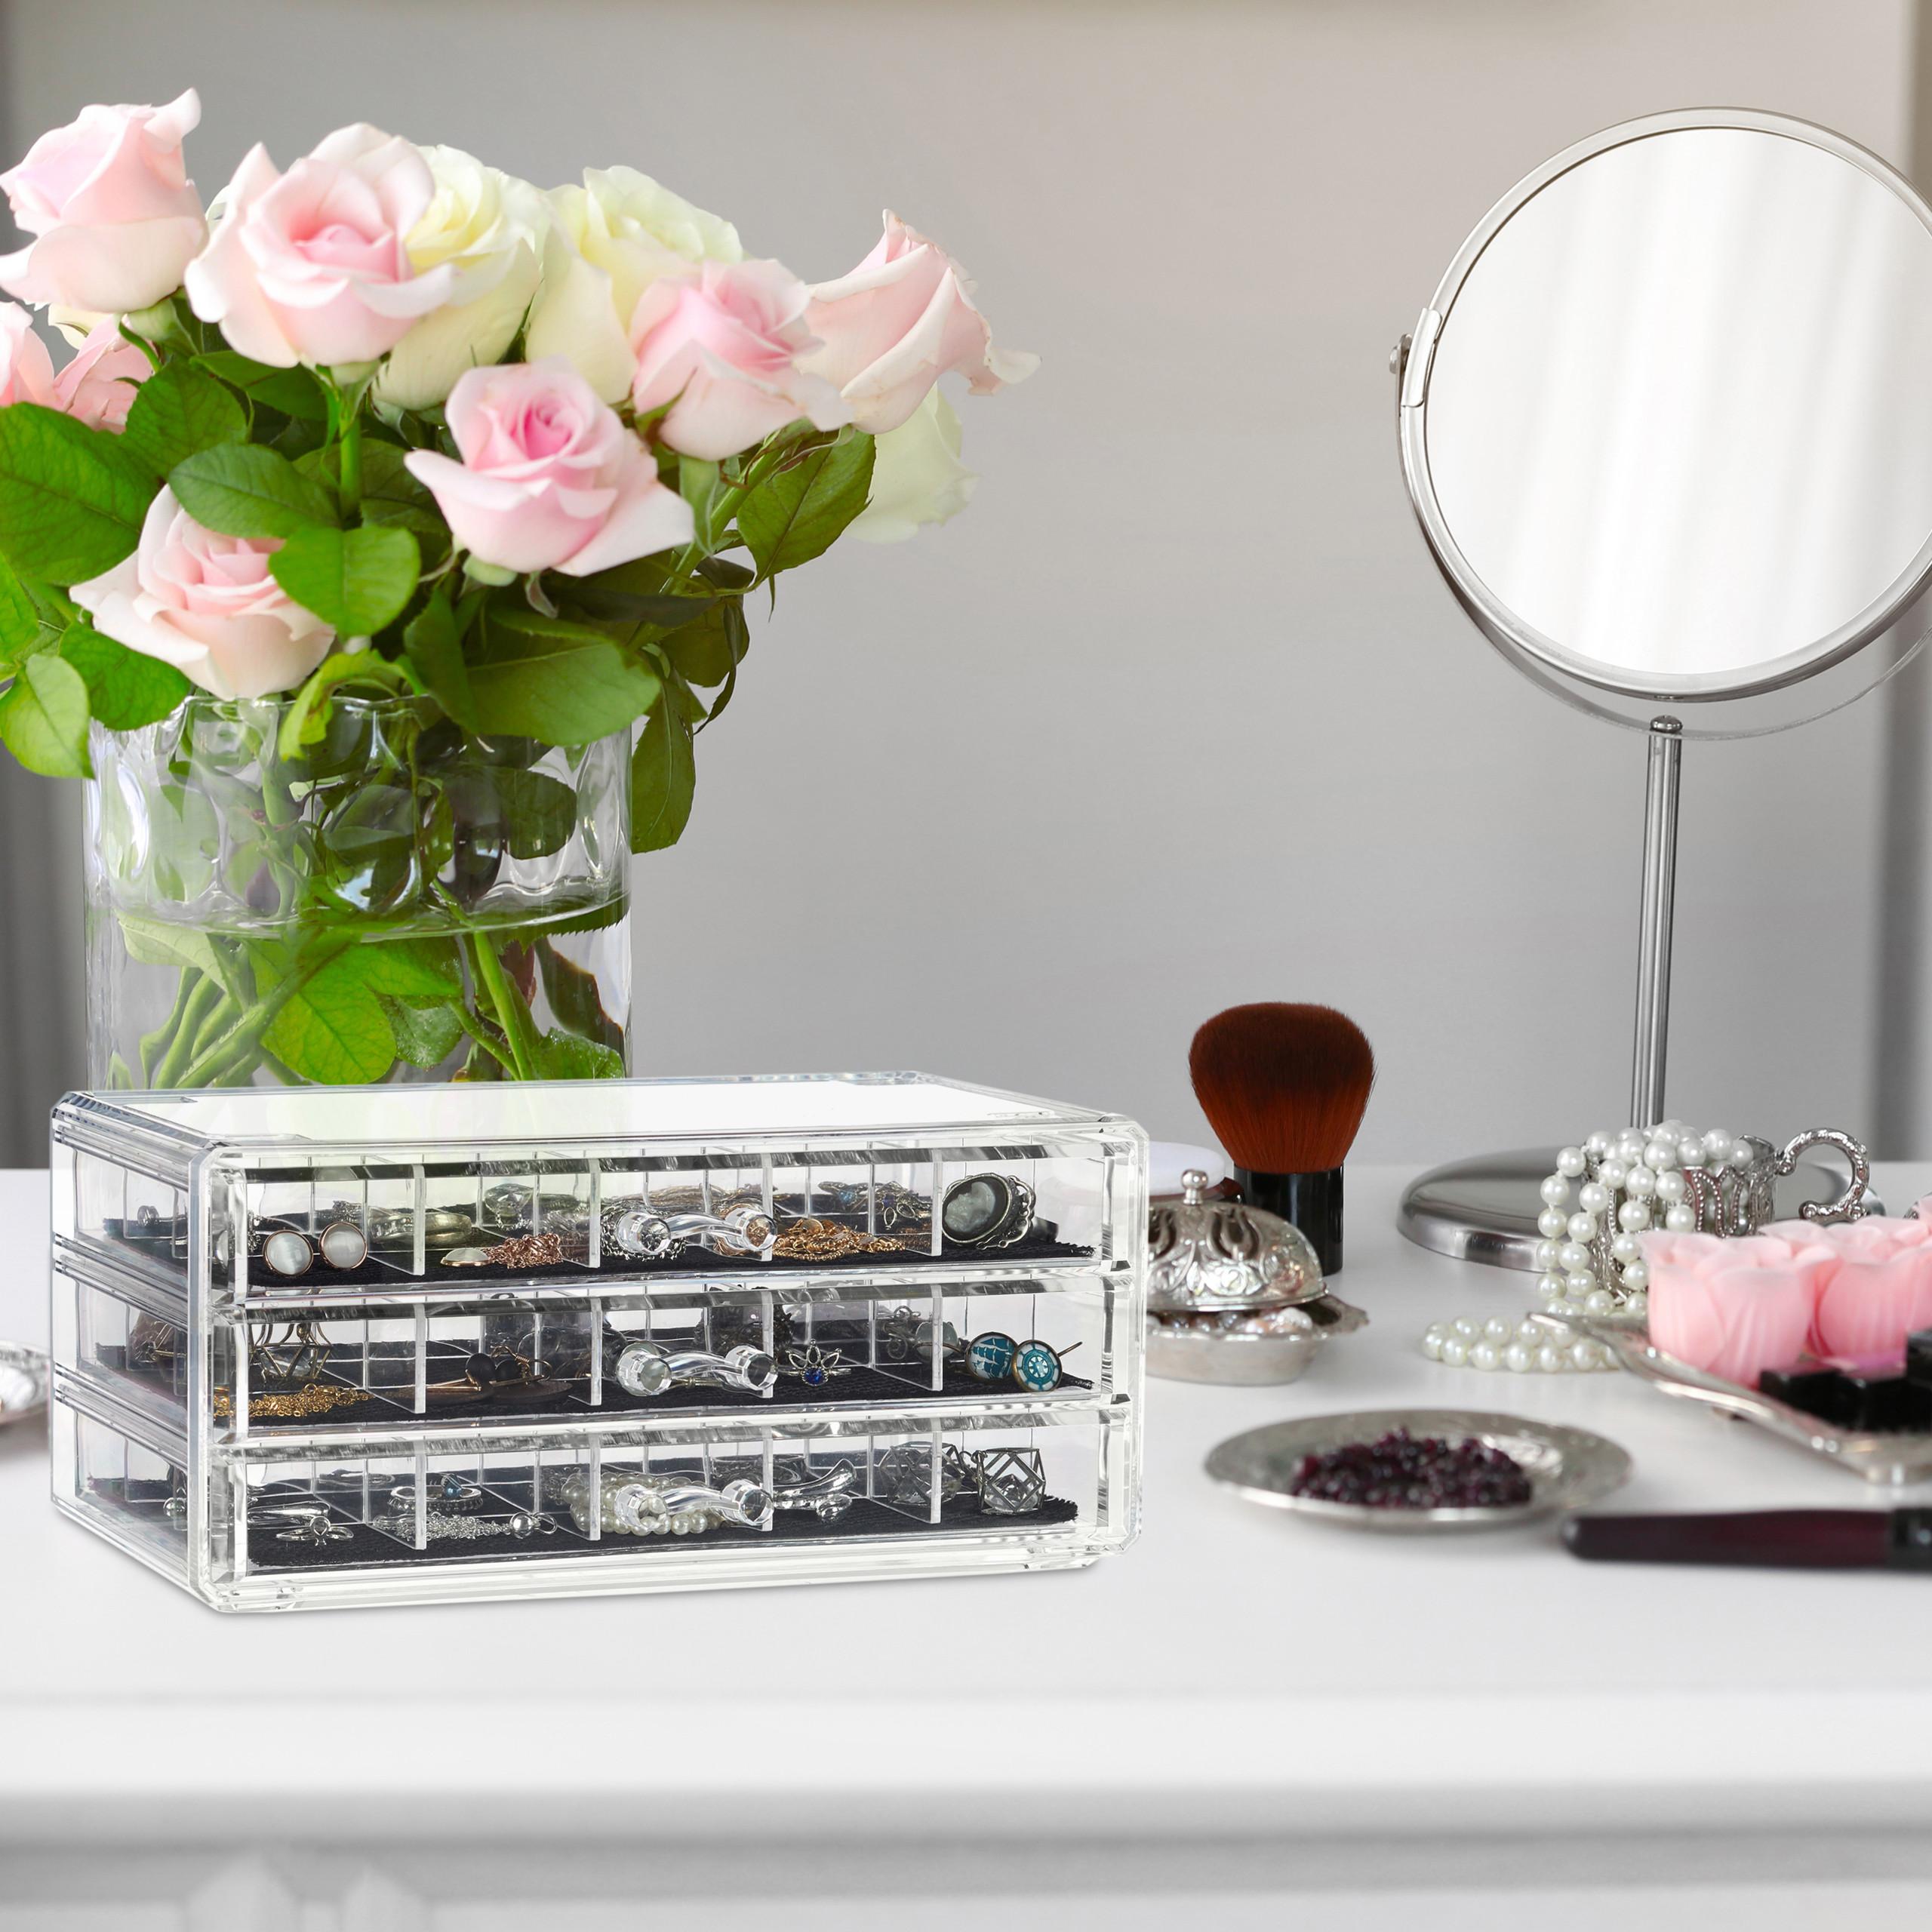 make-up-organizer-acryl-3-lades-met-vakken-acrylbox-cosmeticabox-opbergdoos miniatuur 4